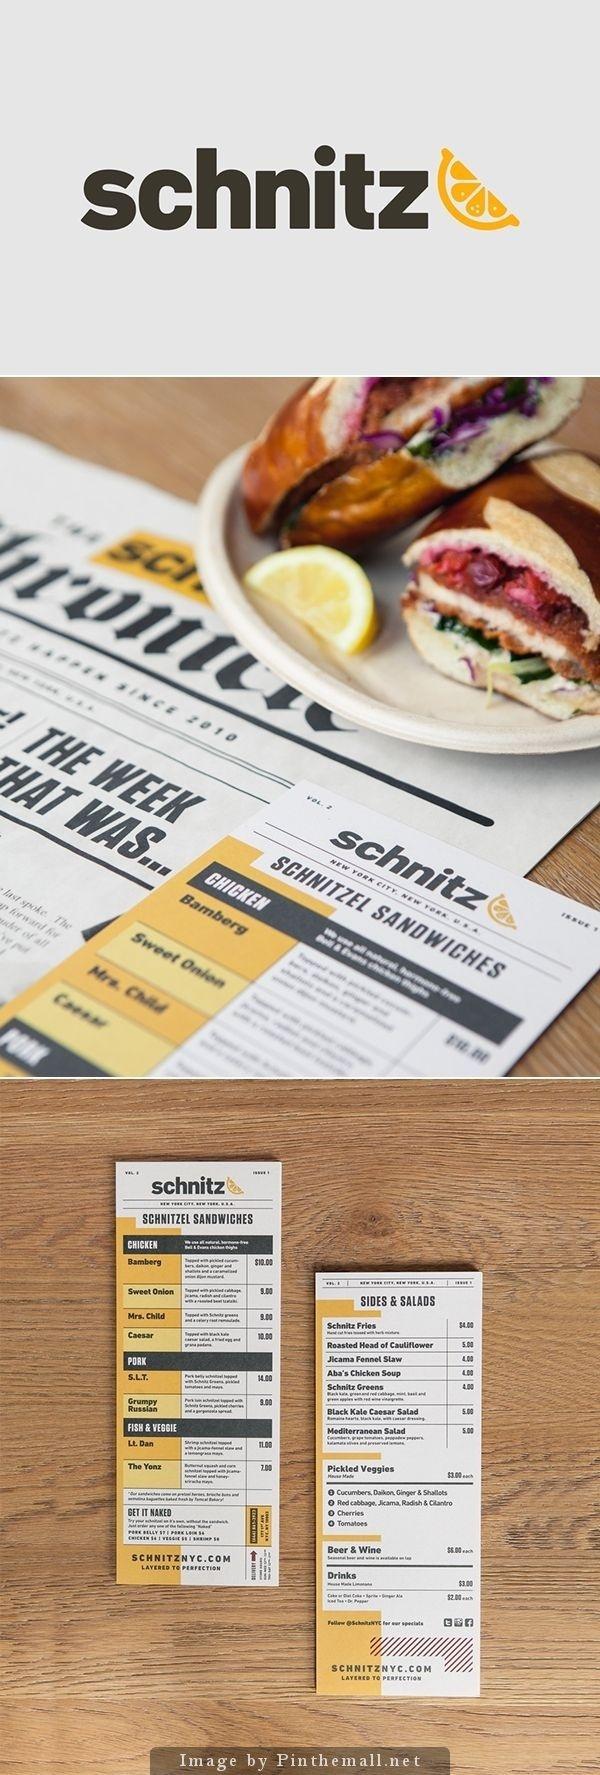 Schnitz menu design